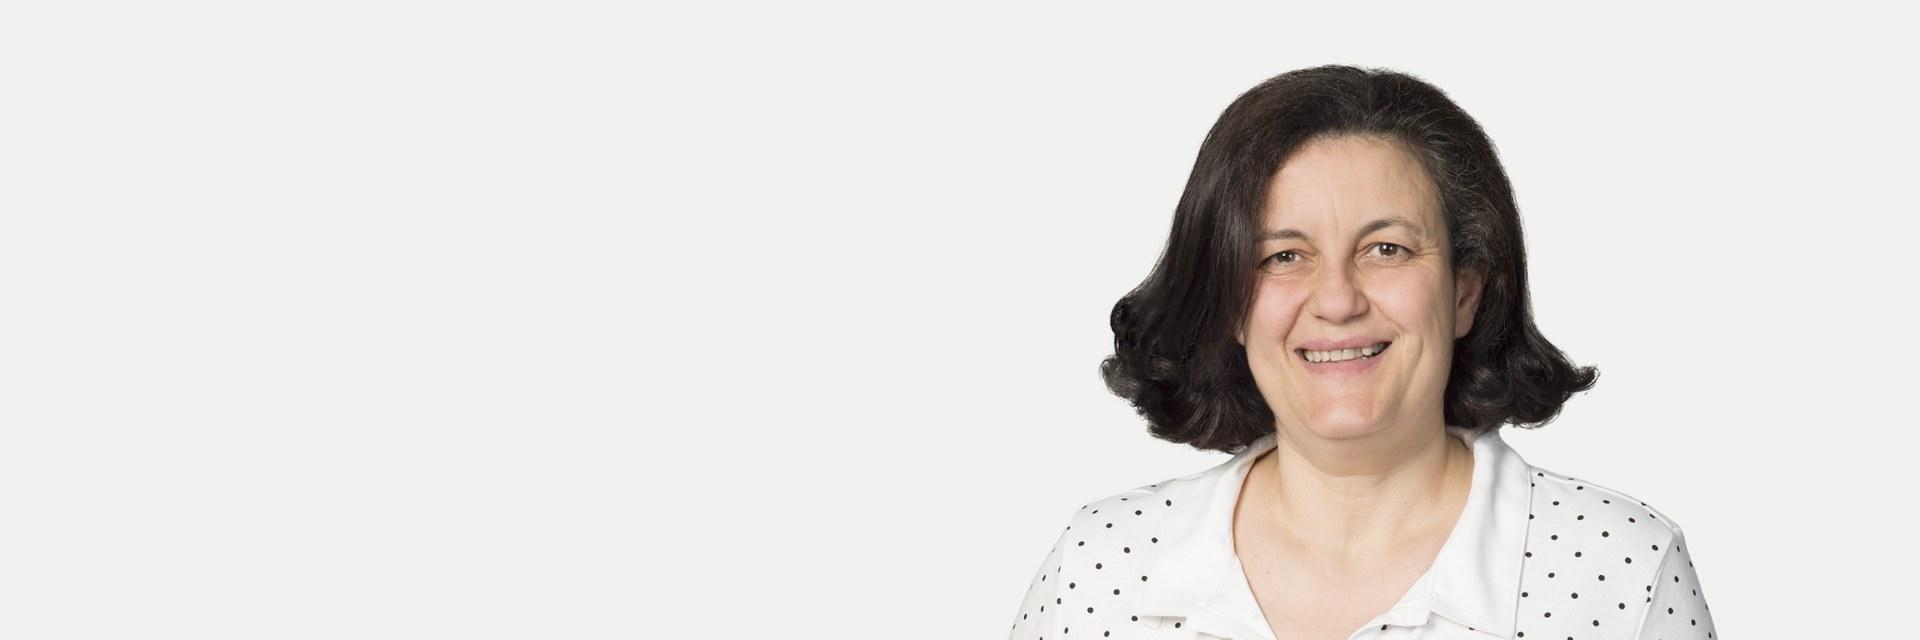 Dr. Nora Corvini